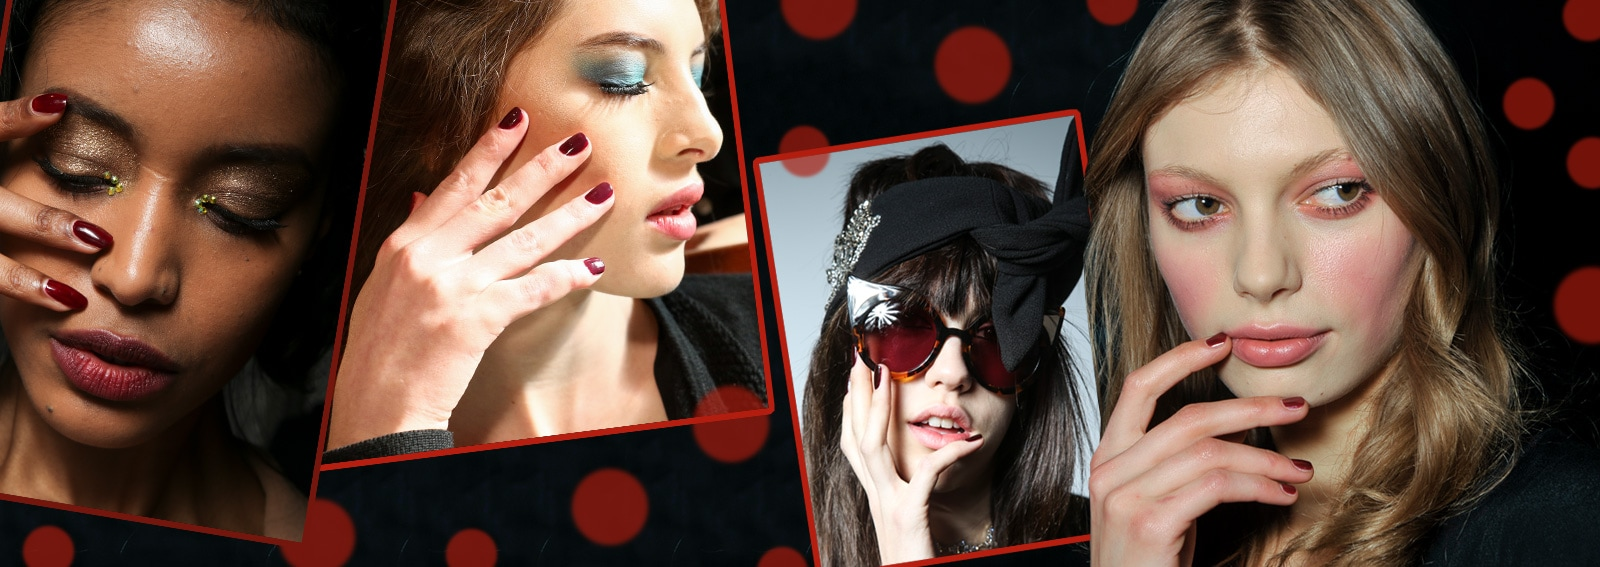 Unghie bordeaux: le idee più belle per una manicure super chic